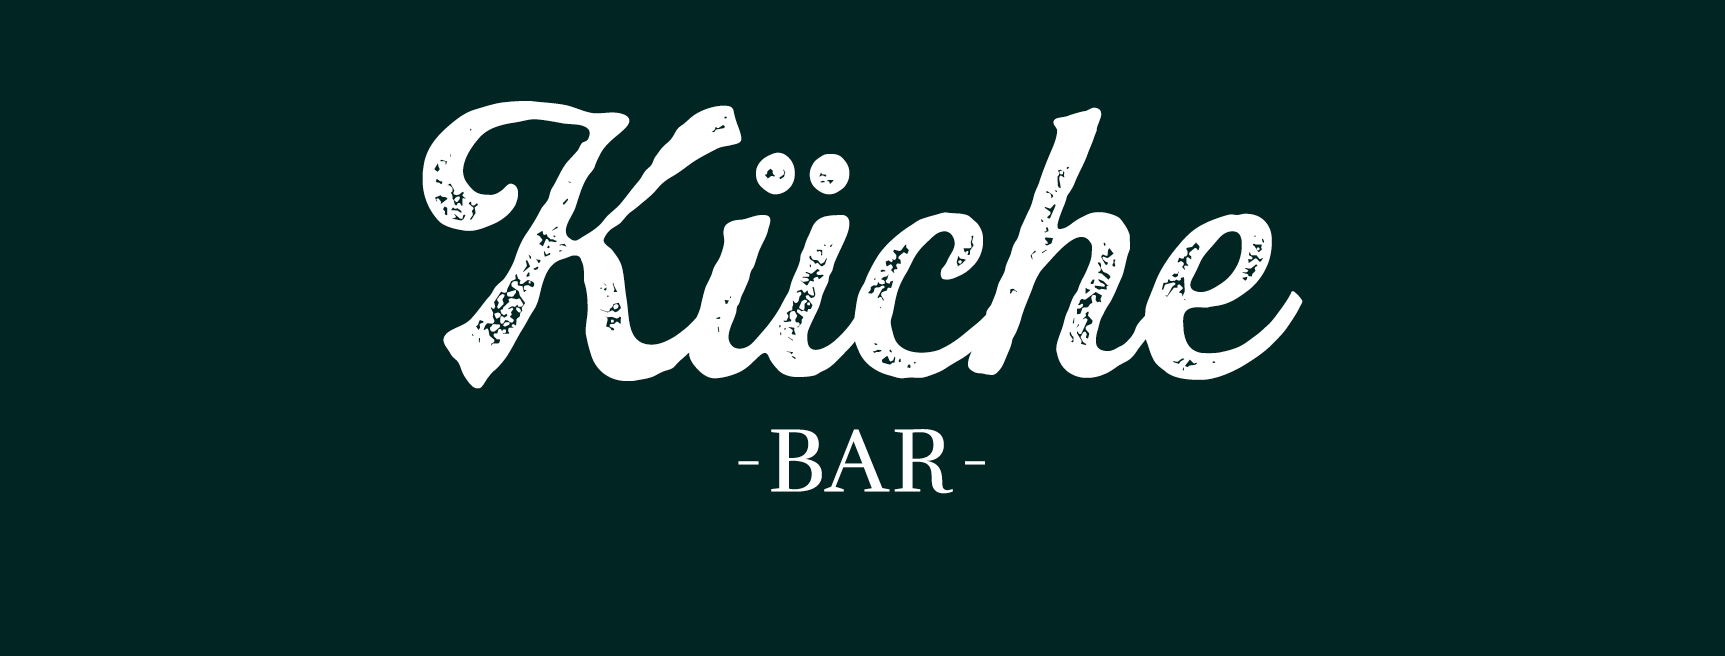 Stunning Küche Mit Bar Pictures - Home Design Ideas - motormania.us